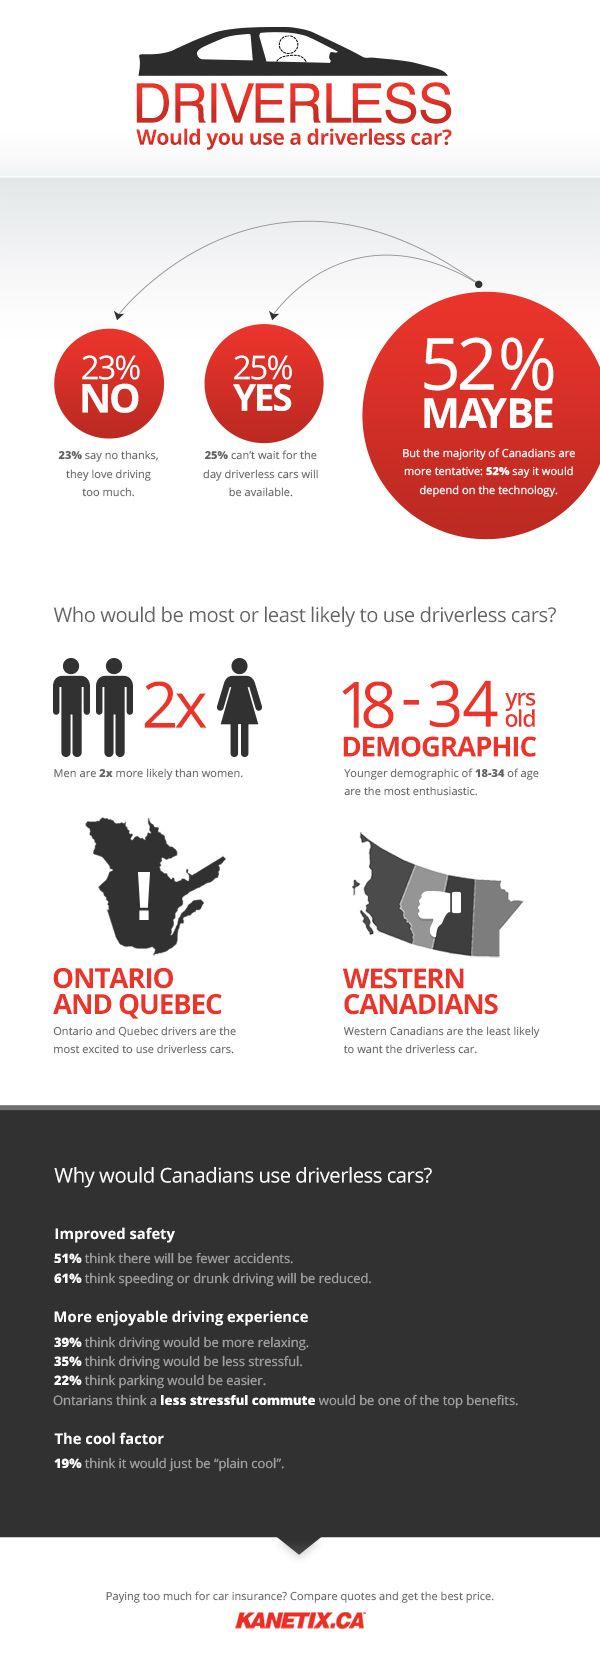 Car Insurance Quotes Ontario Kanetix